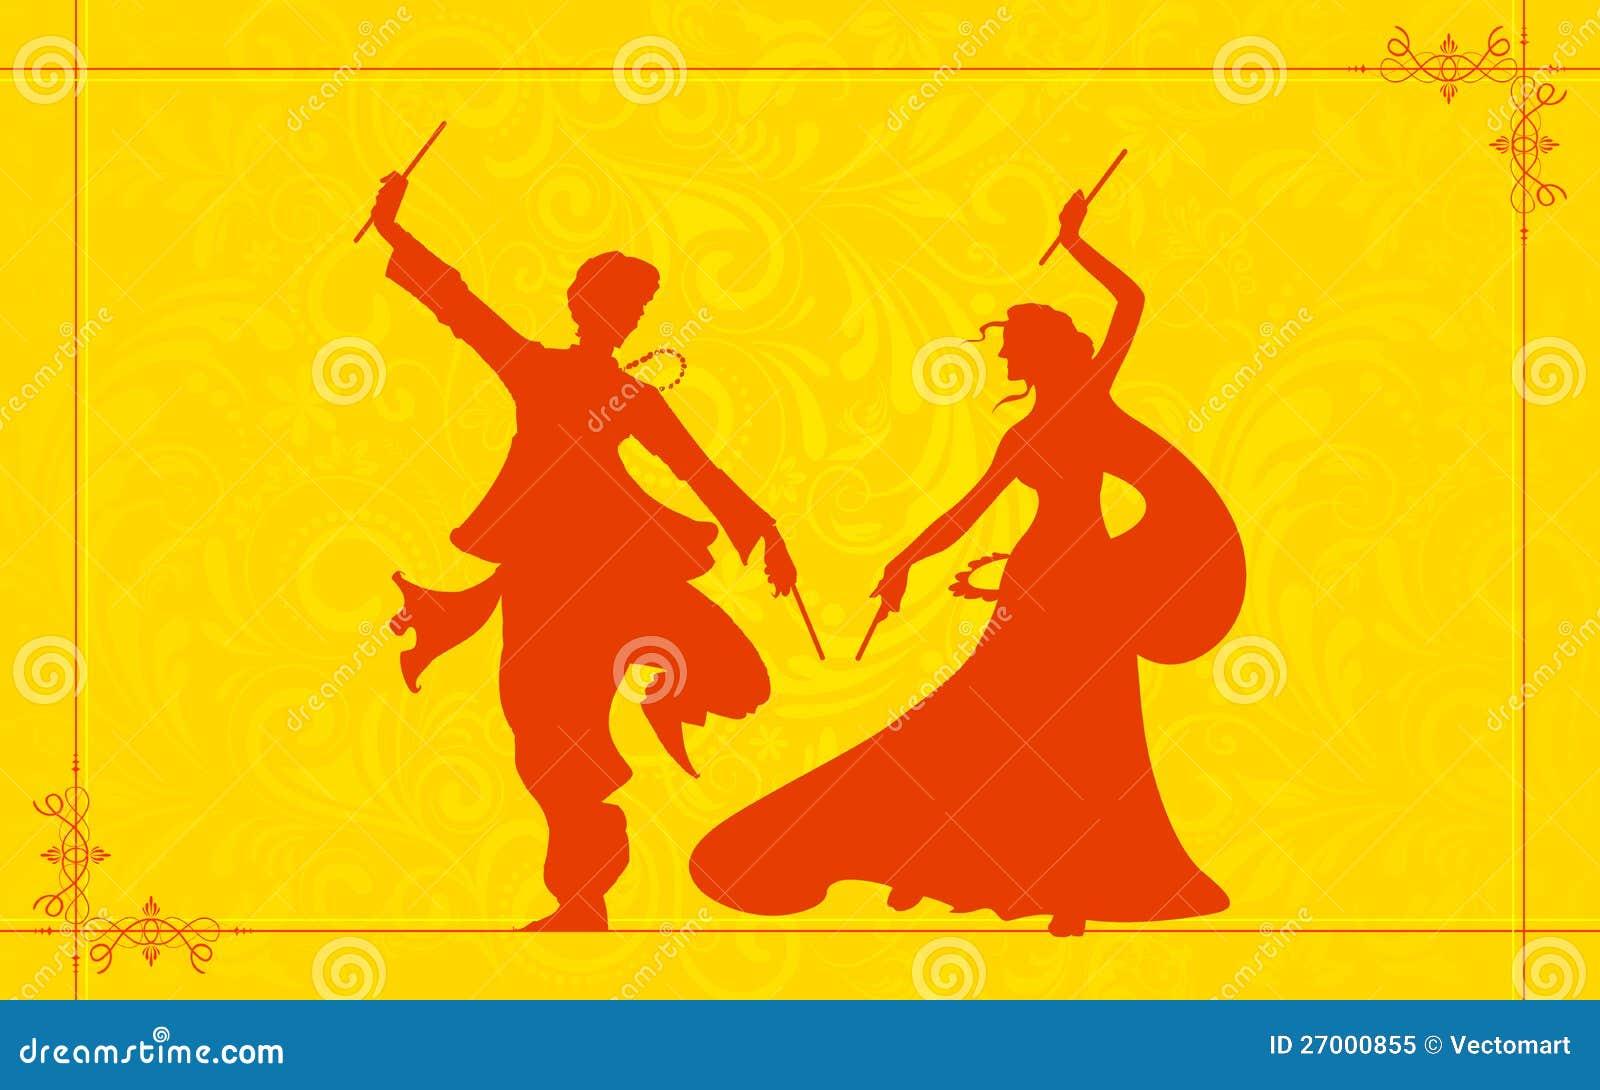 Illustration of couple playing garba on Navratri Dandiya Dance Clipart